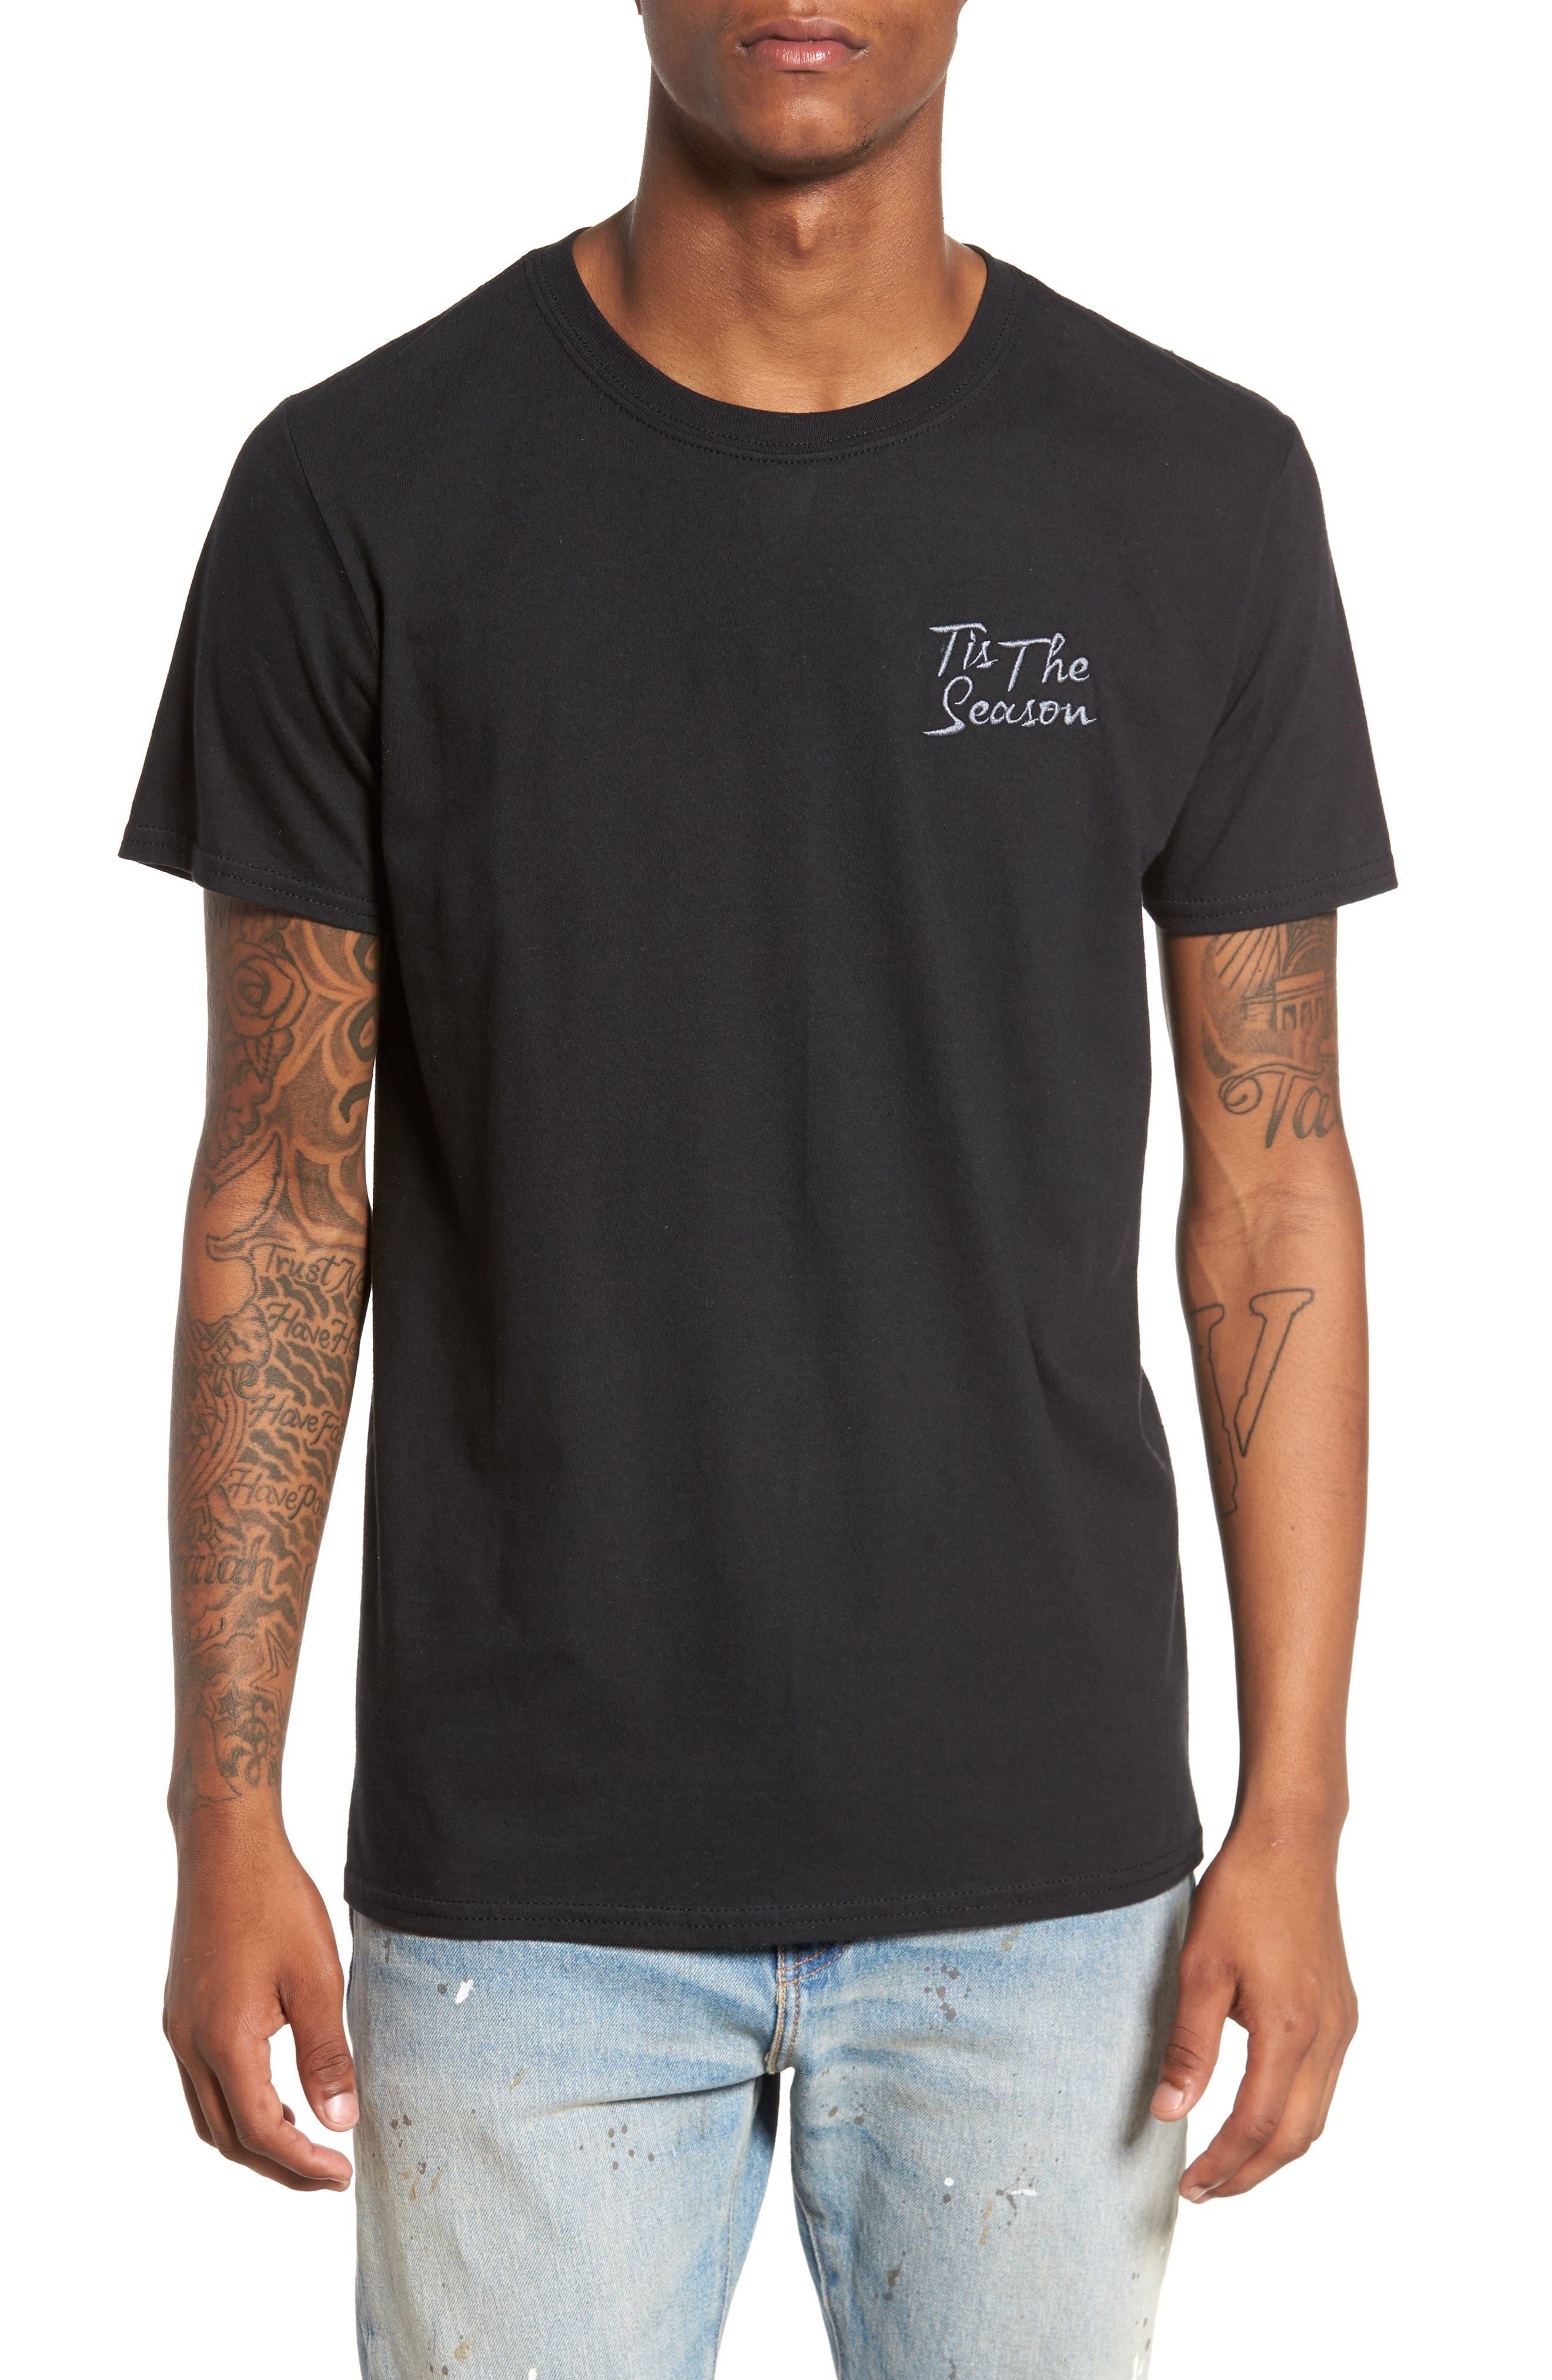 Tis The Season Embroidered T-Shirt,                             Main thumbnail 1, color,                             001